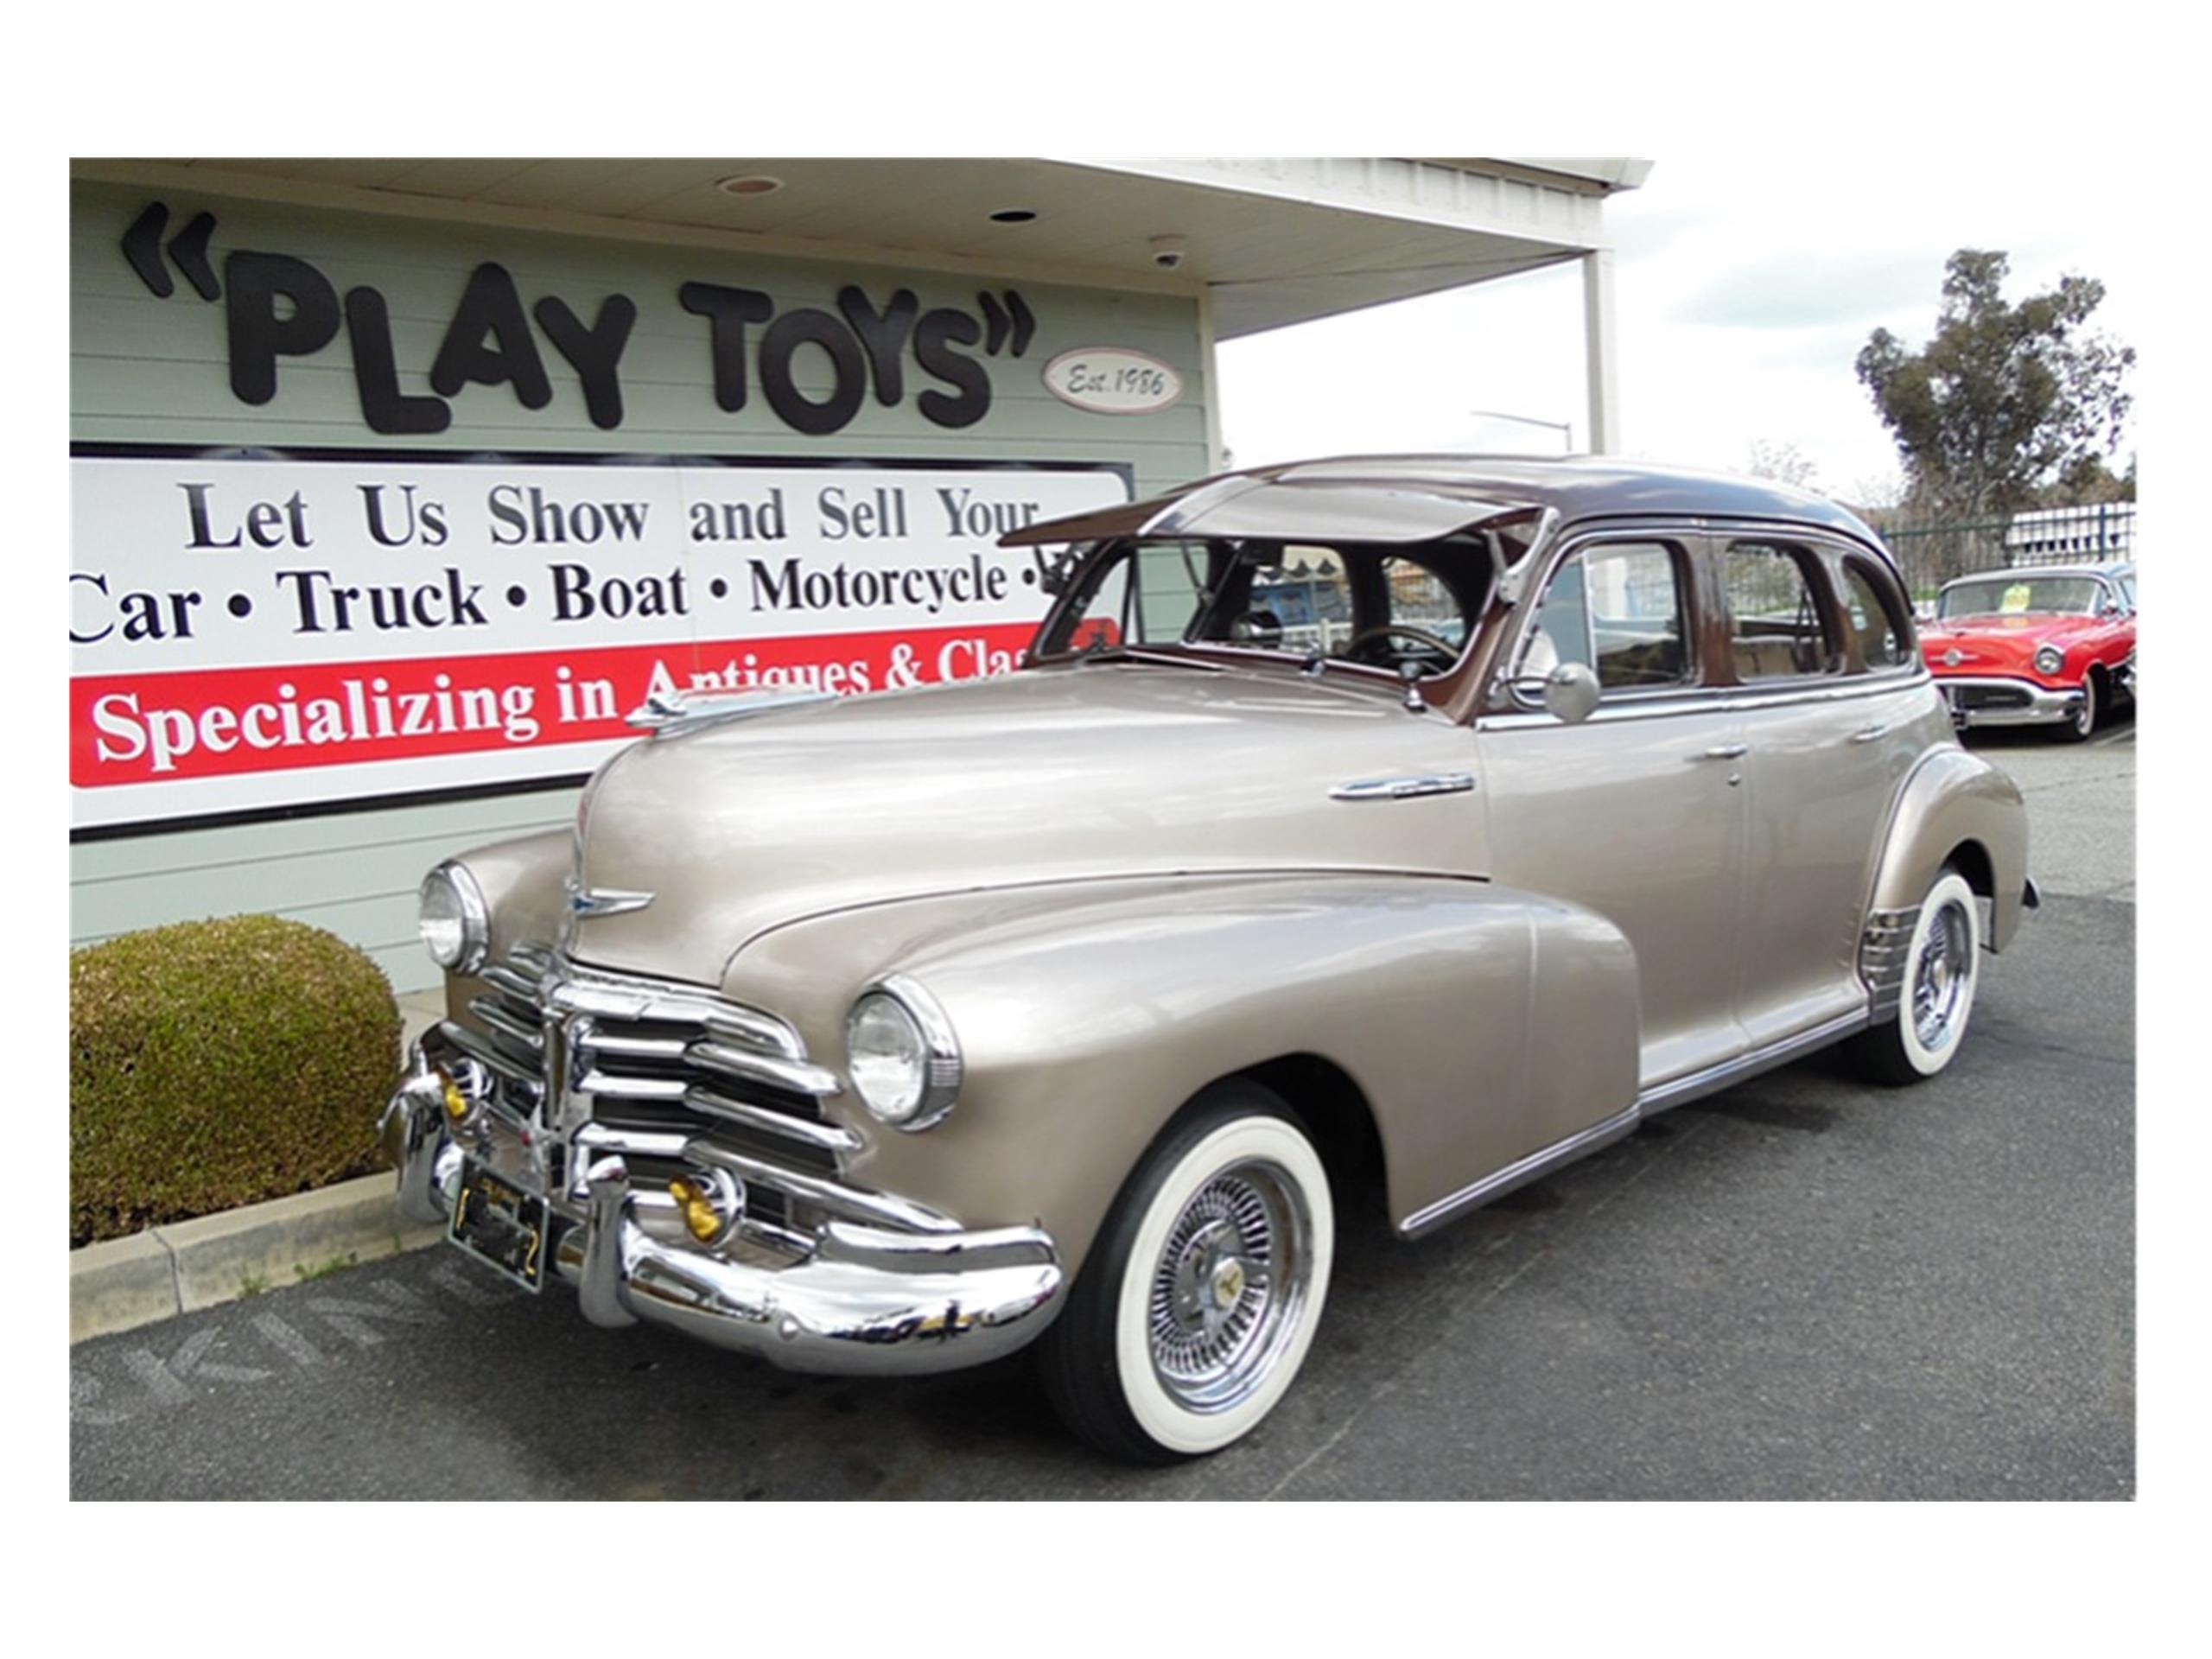 1948 Chevy Fleetline Interior Award House Designer Today 1949 Truck Lowrider Chevrolet Fleetmaster For Sale Classiccars Com Cc 1078489 Rh Coupe